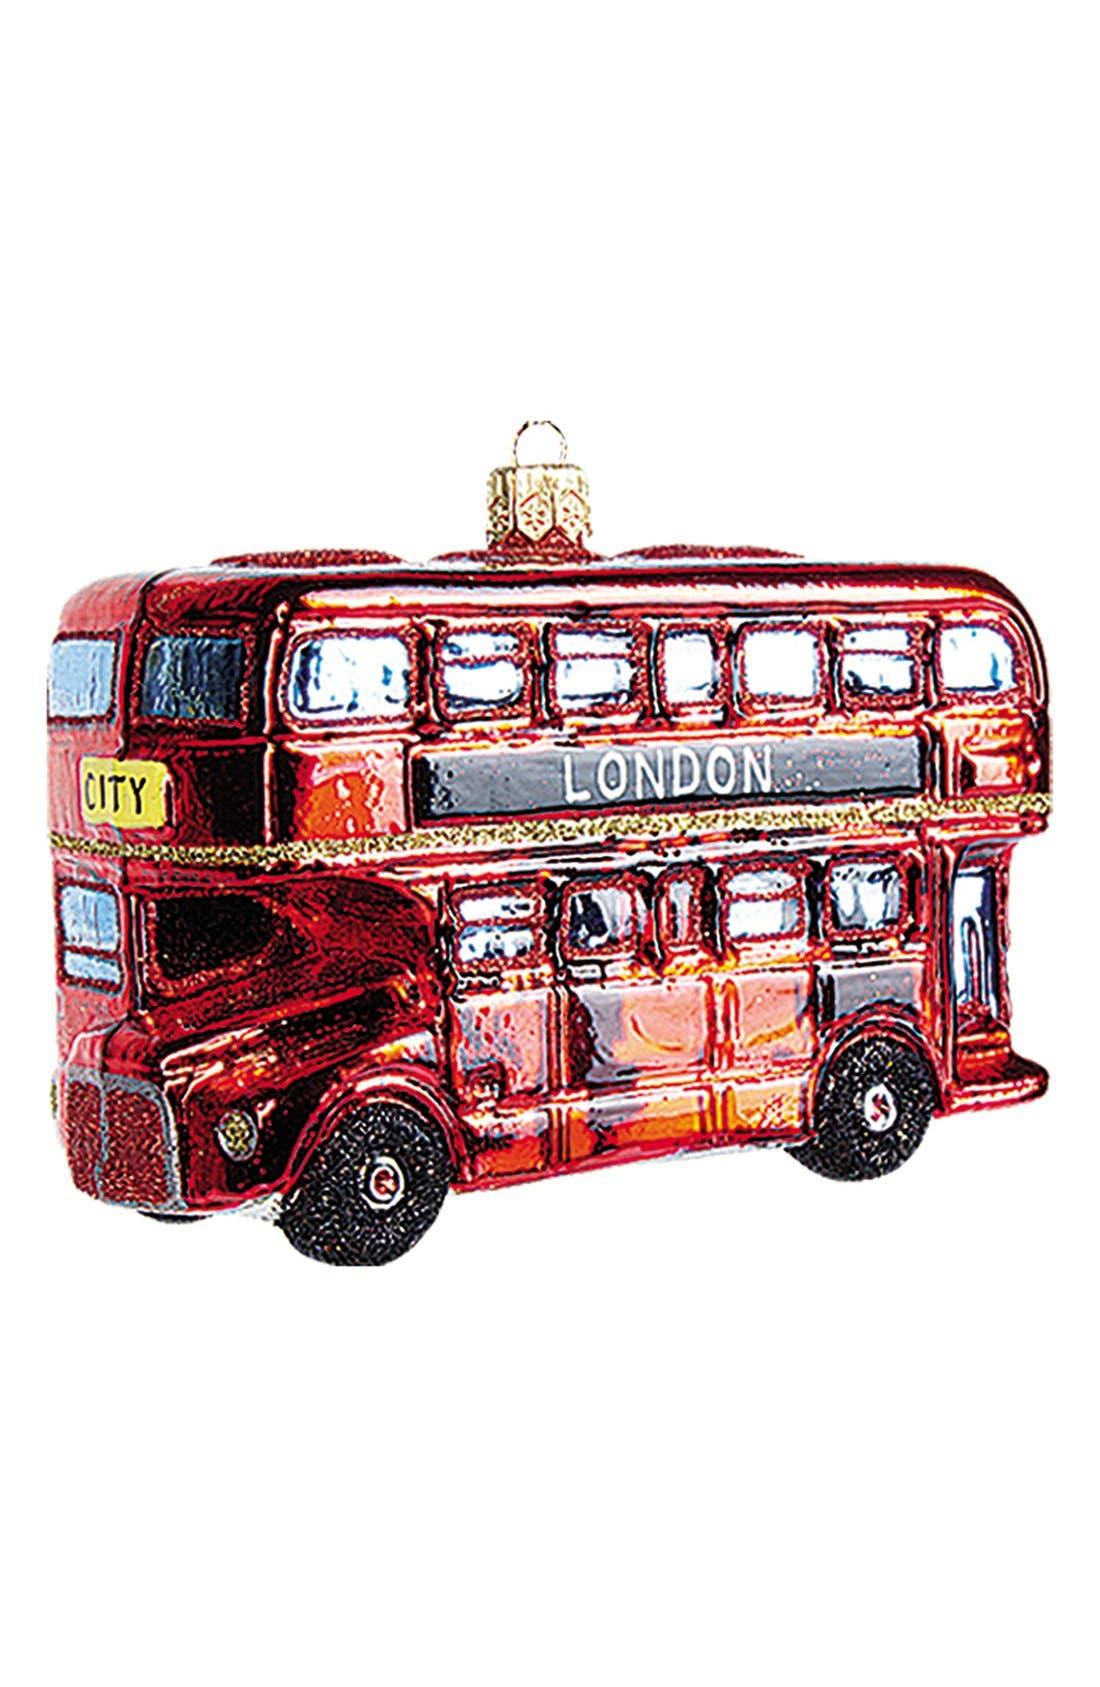 London Bus Handblown Glass Ornament,                         Main,                         color, 600